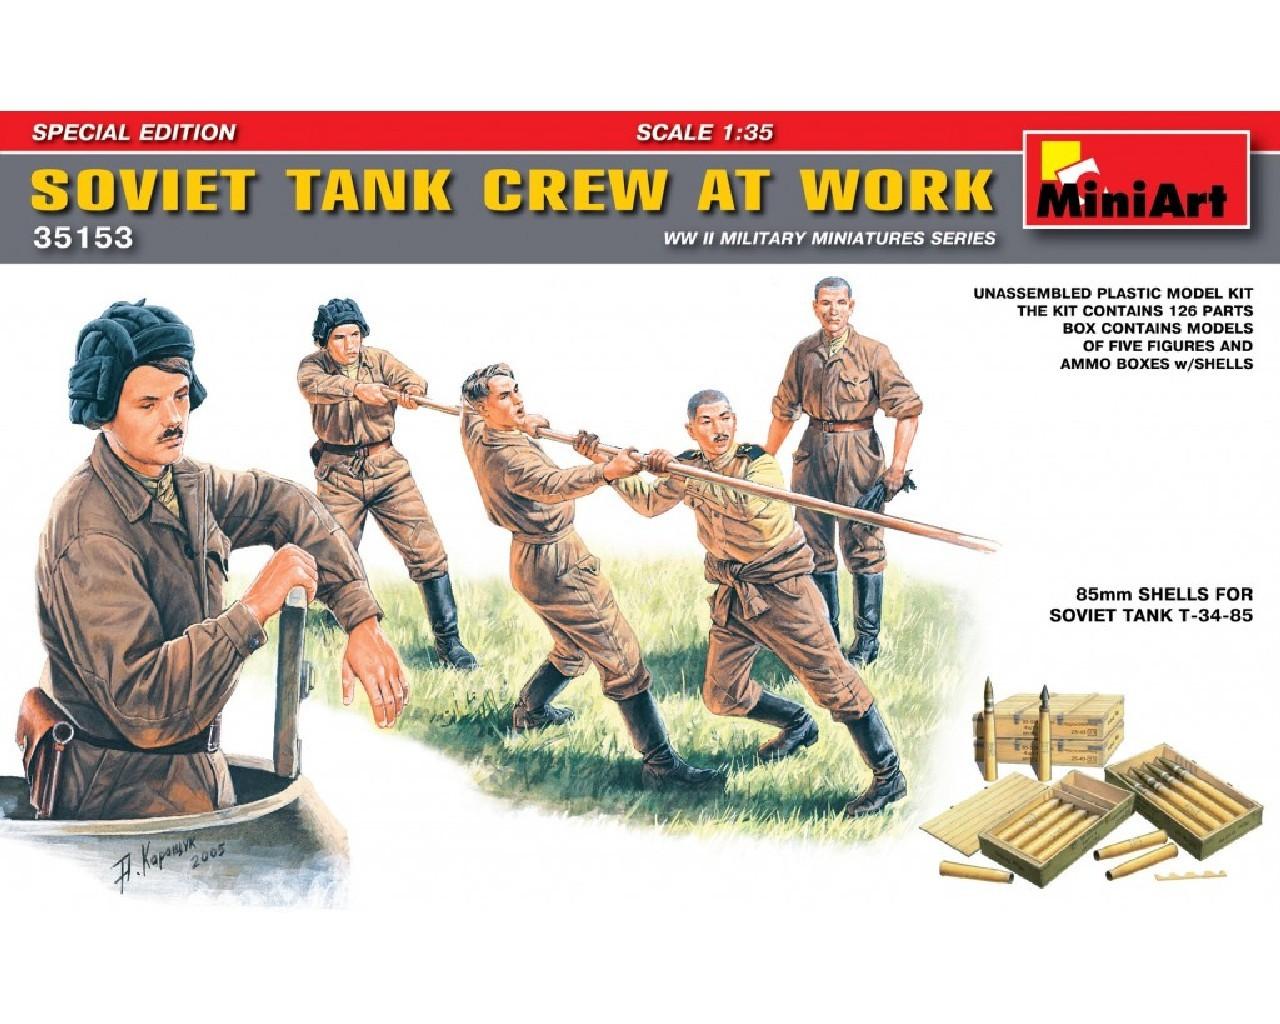 1/35 Soviet Tank Crew at Work. Special Edition